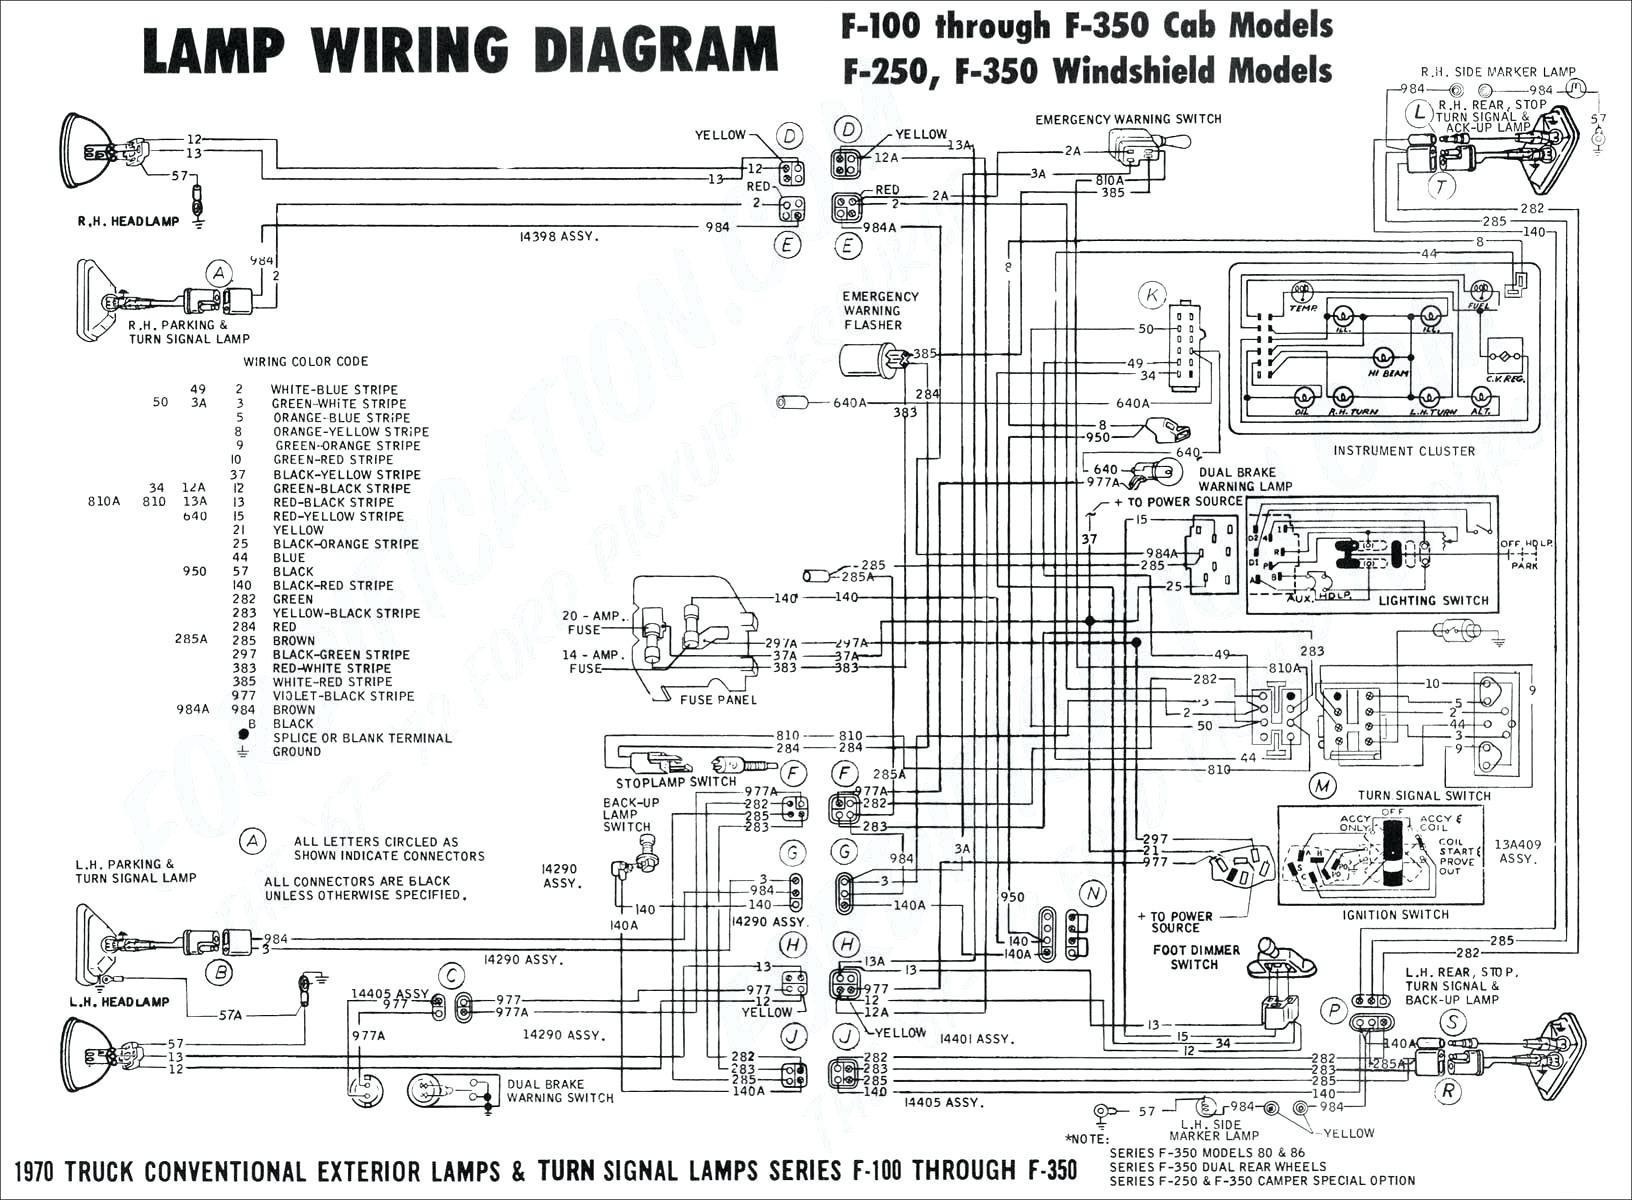 1999 ford F250 Brake Lights Wiring Diagram Pool Light Wiring Diagram Of 1999 ford F250 Brake Lights Wiring Diagram